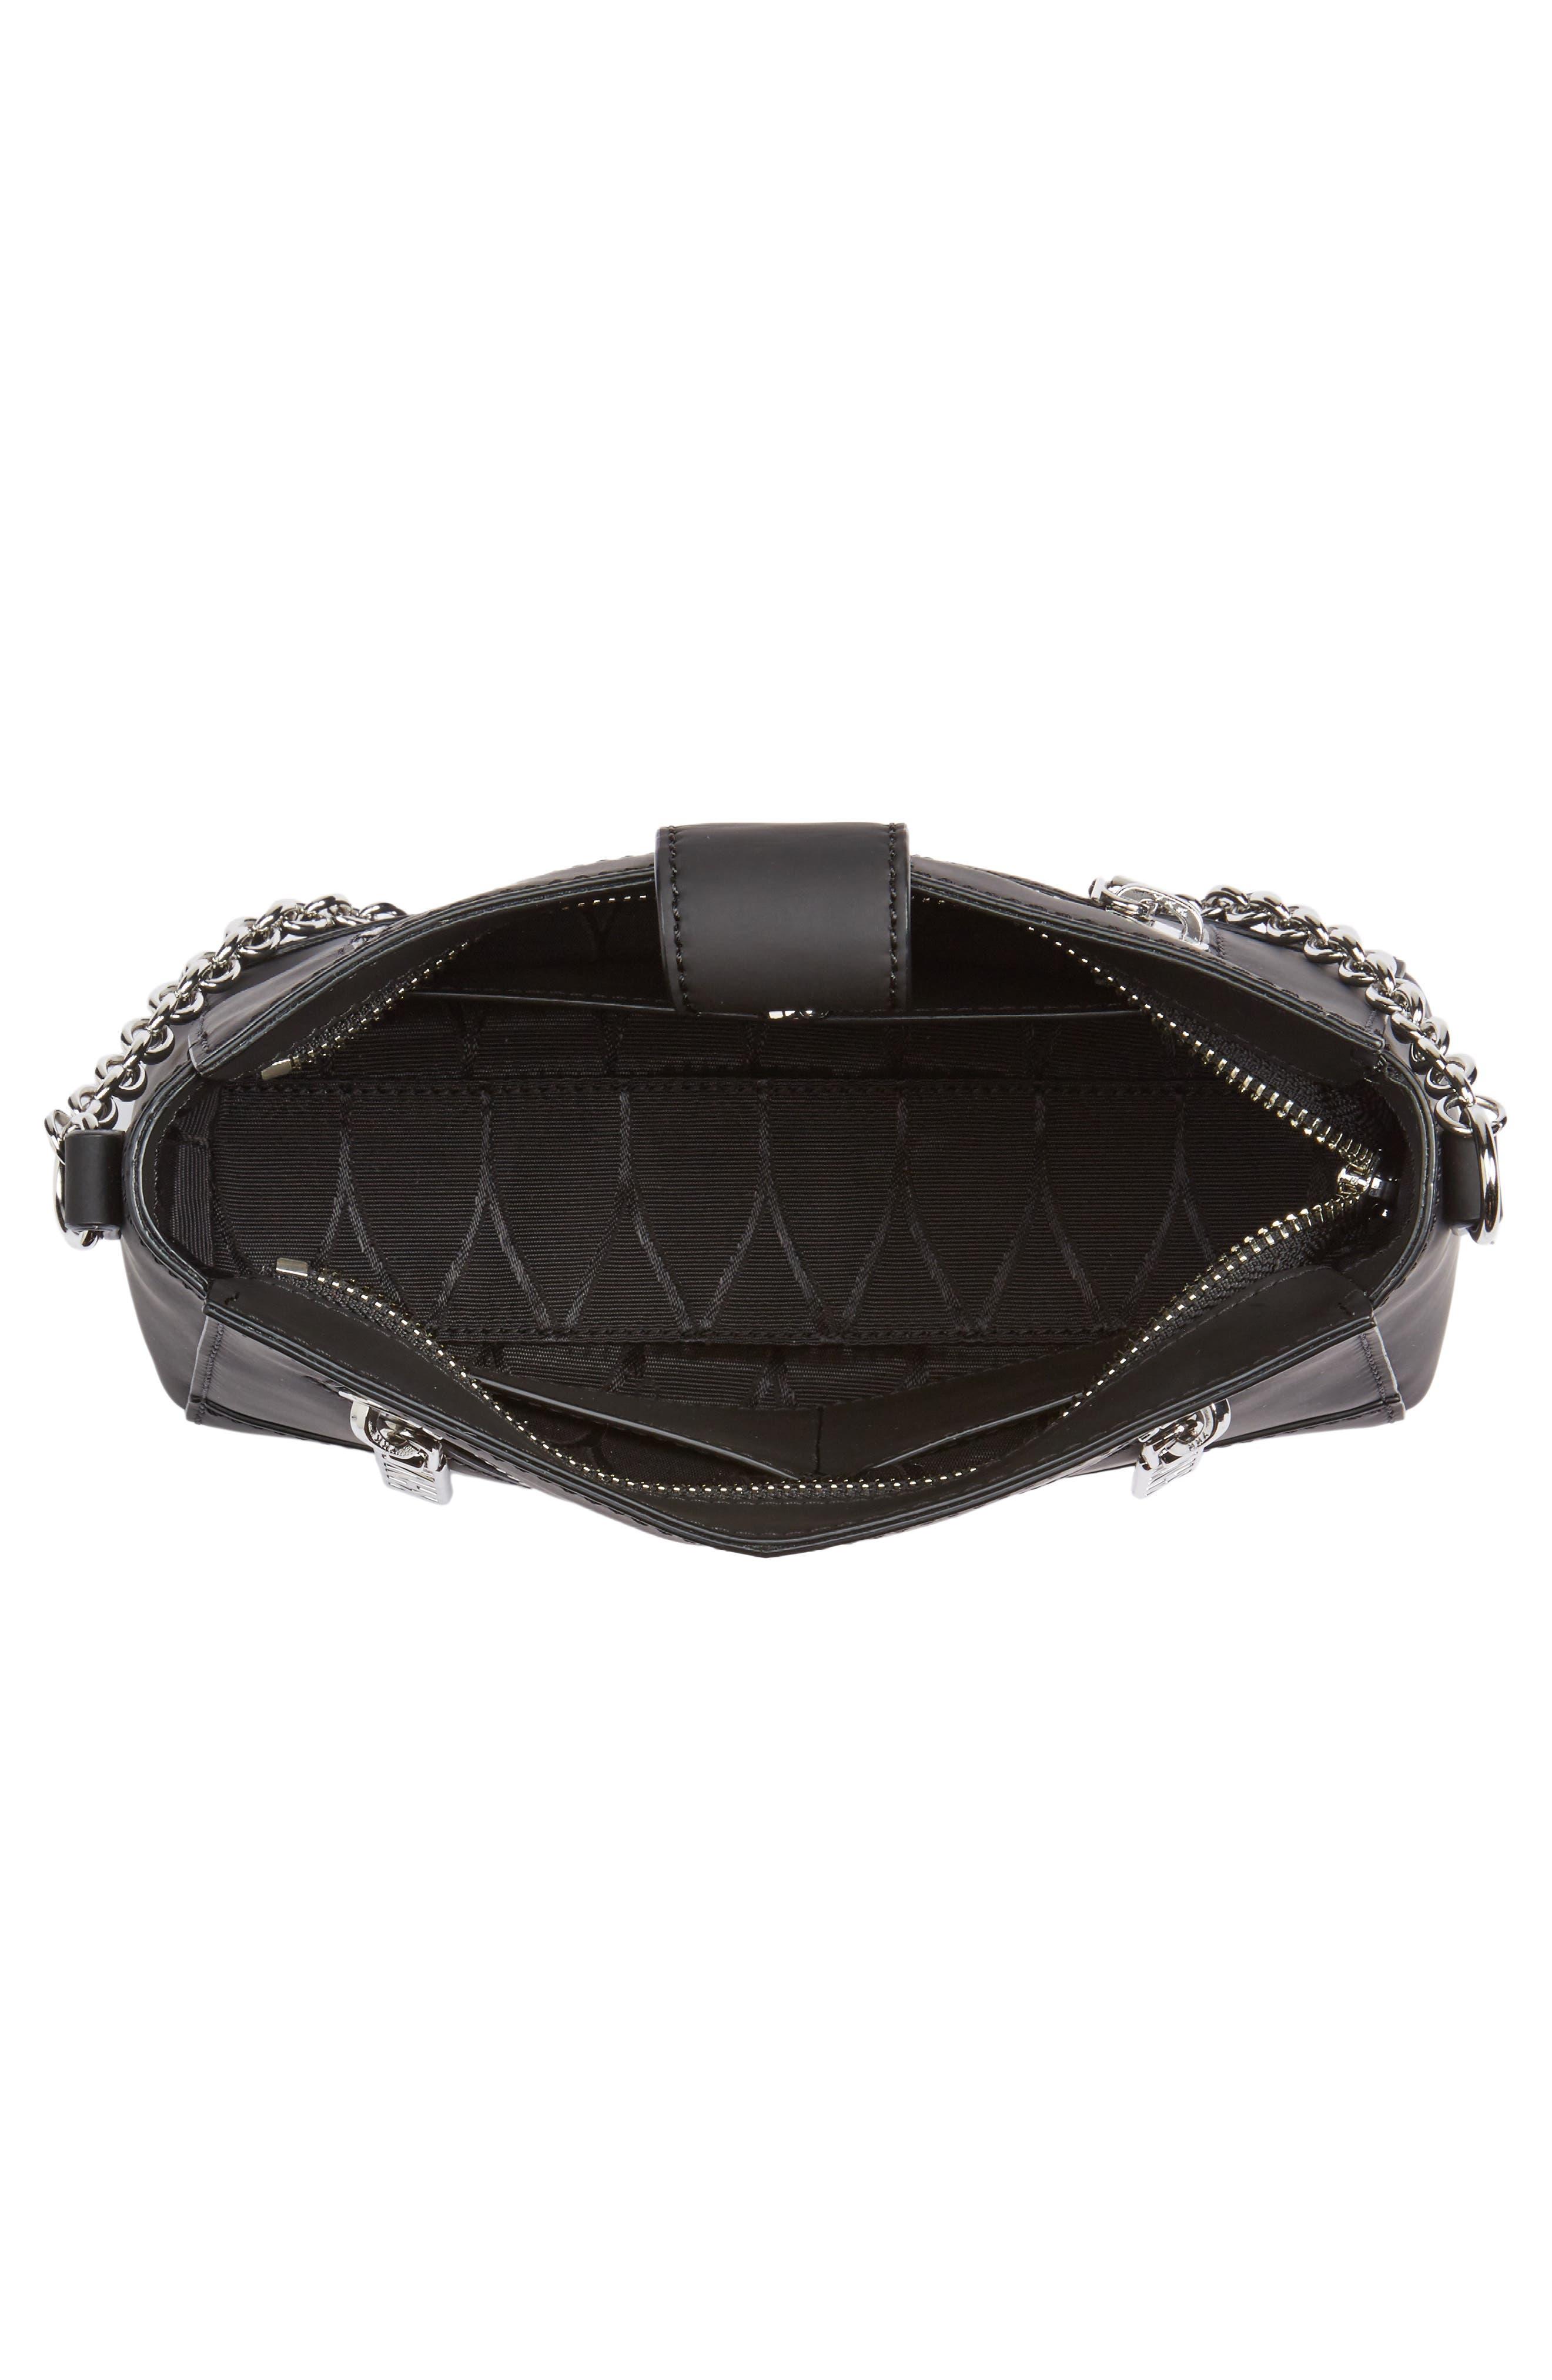 Mini Kalifornia Grommato Leather Shoulder Bag,                             Alternate thumbnail 4, color,                             001